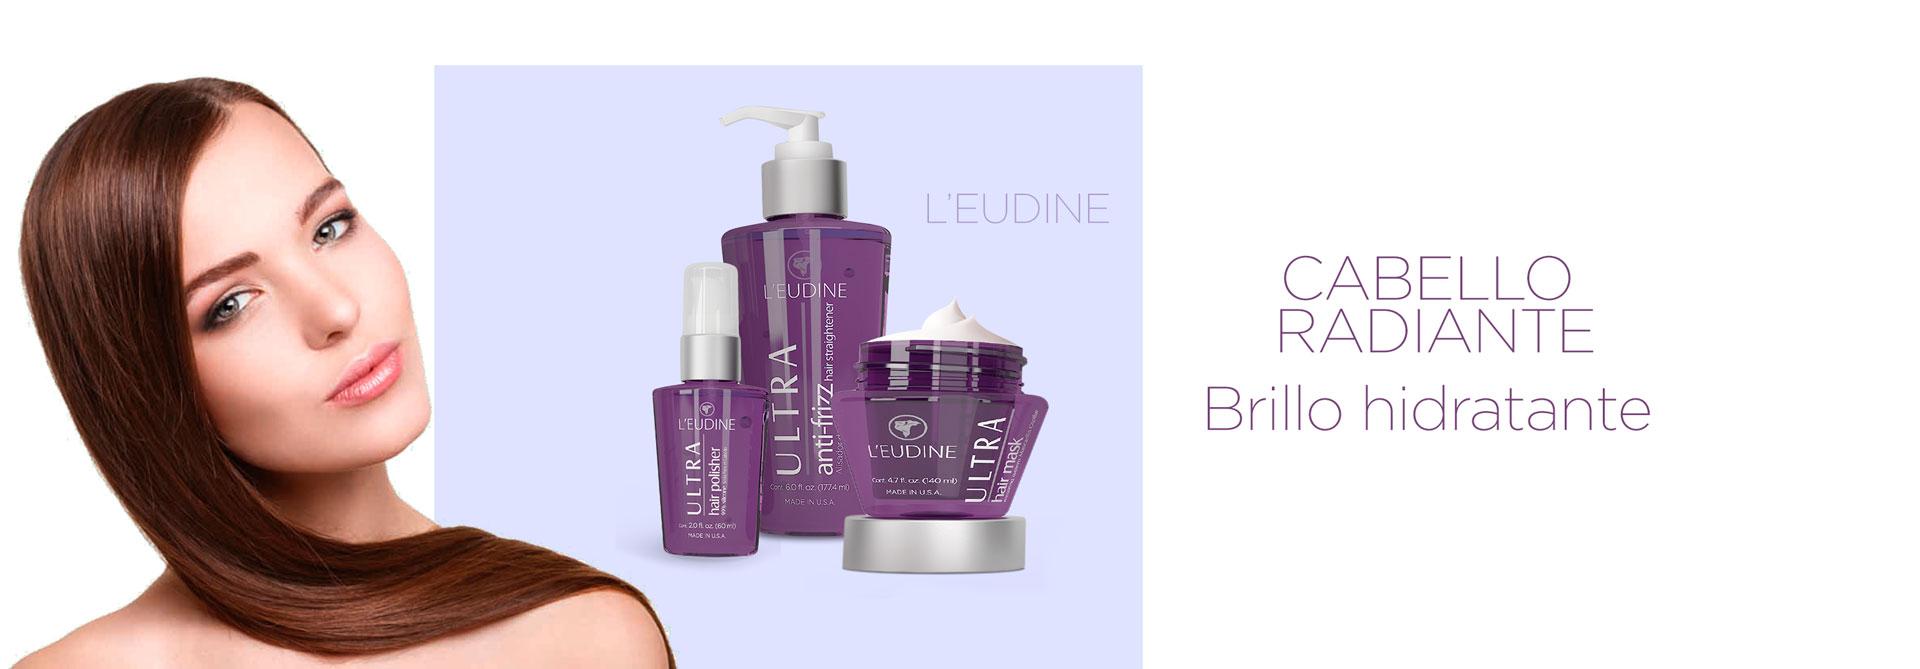 tratamientos-leudine-inicio-5-3